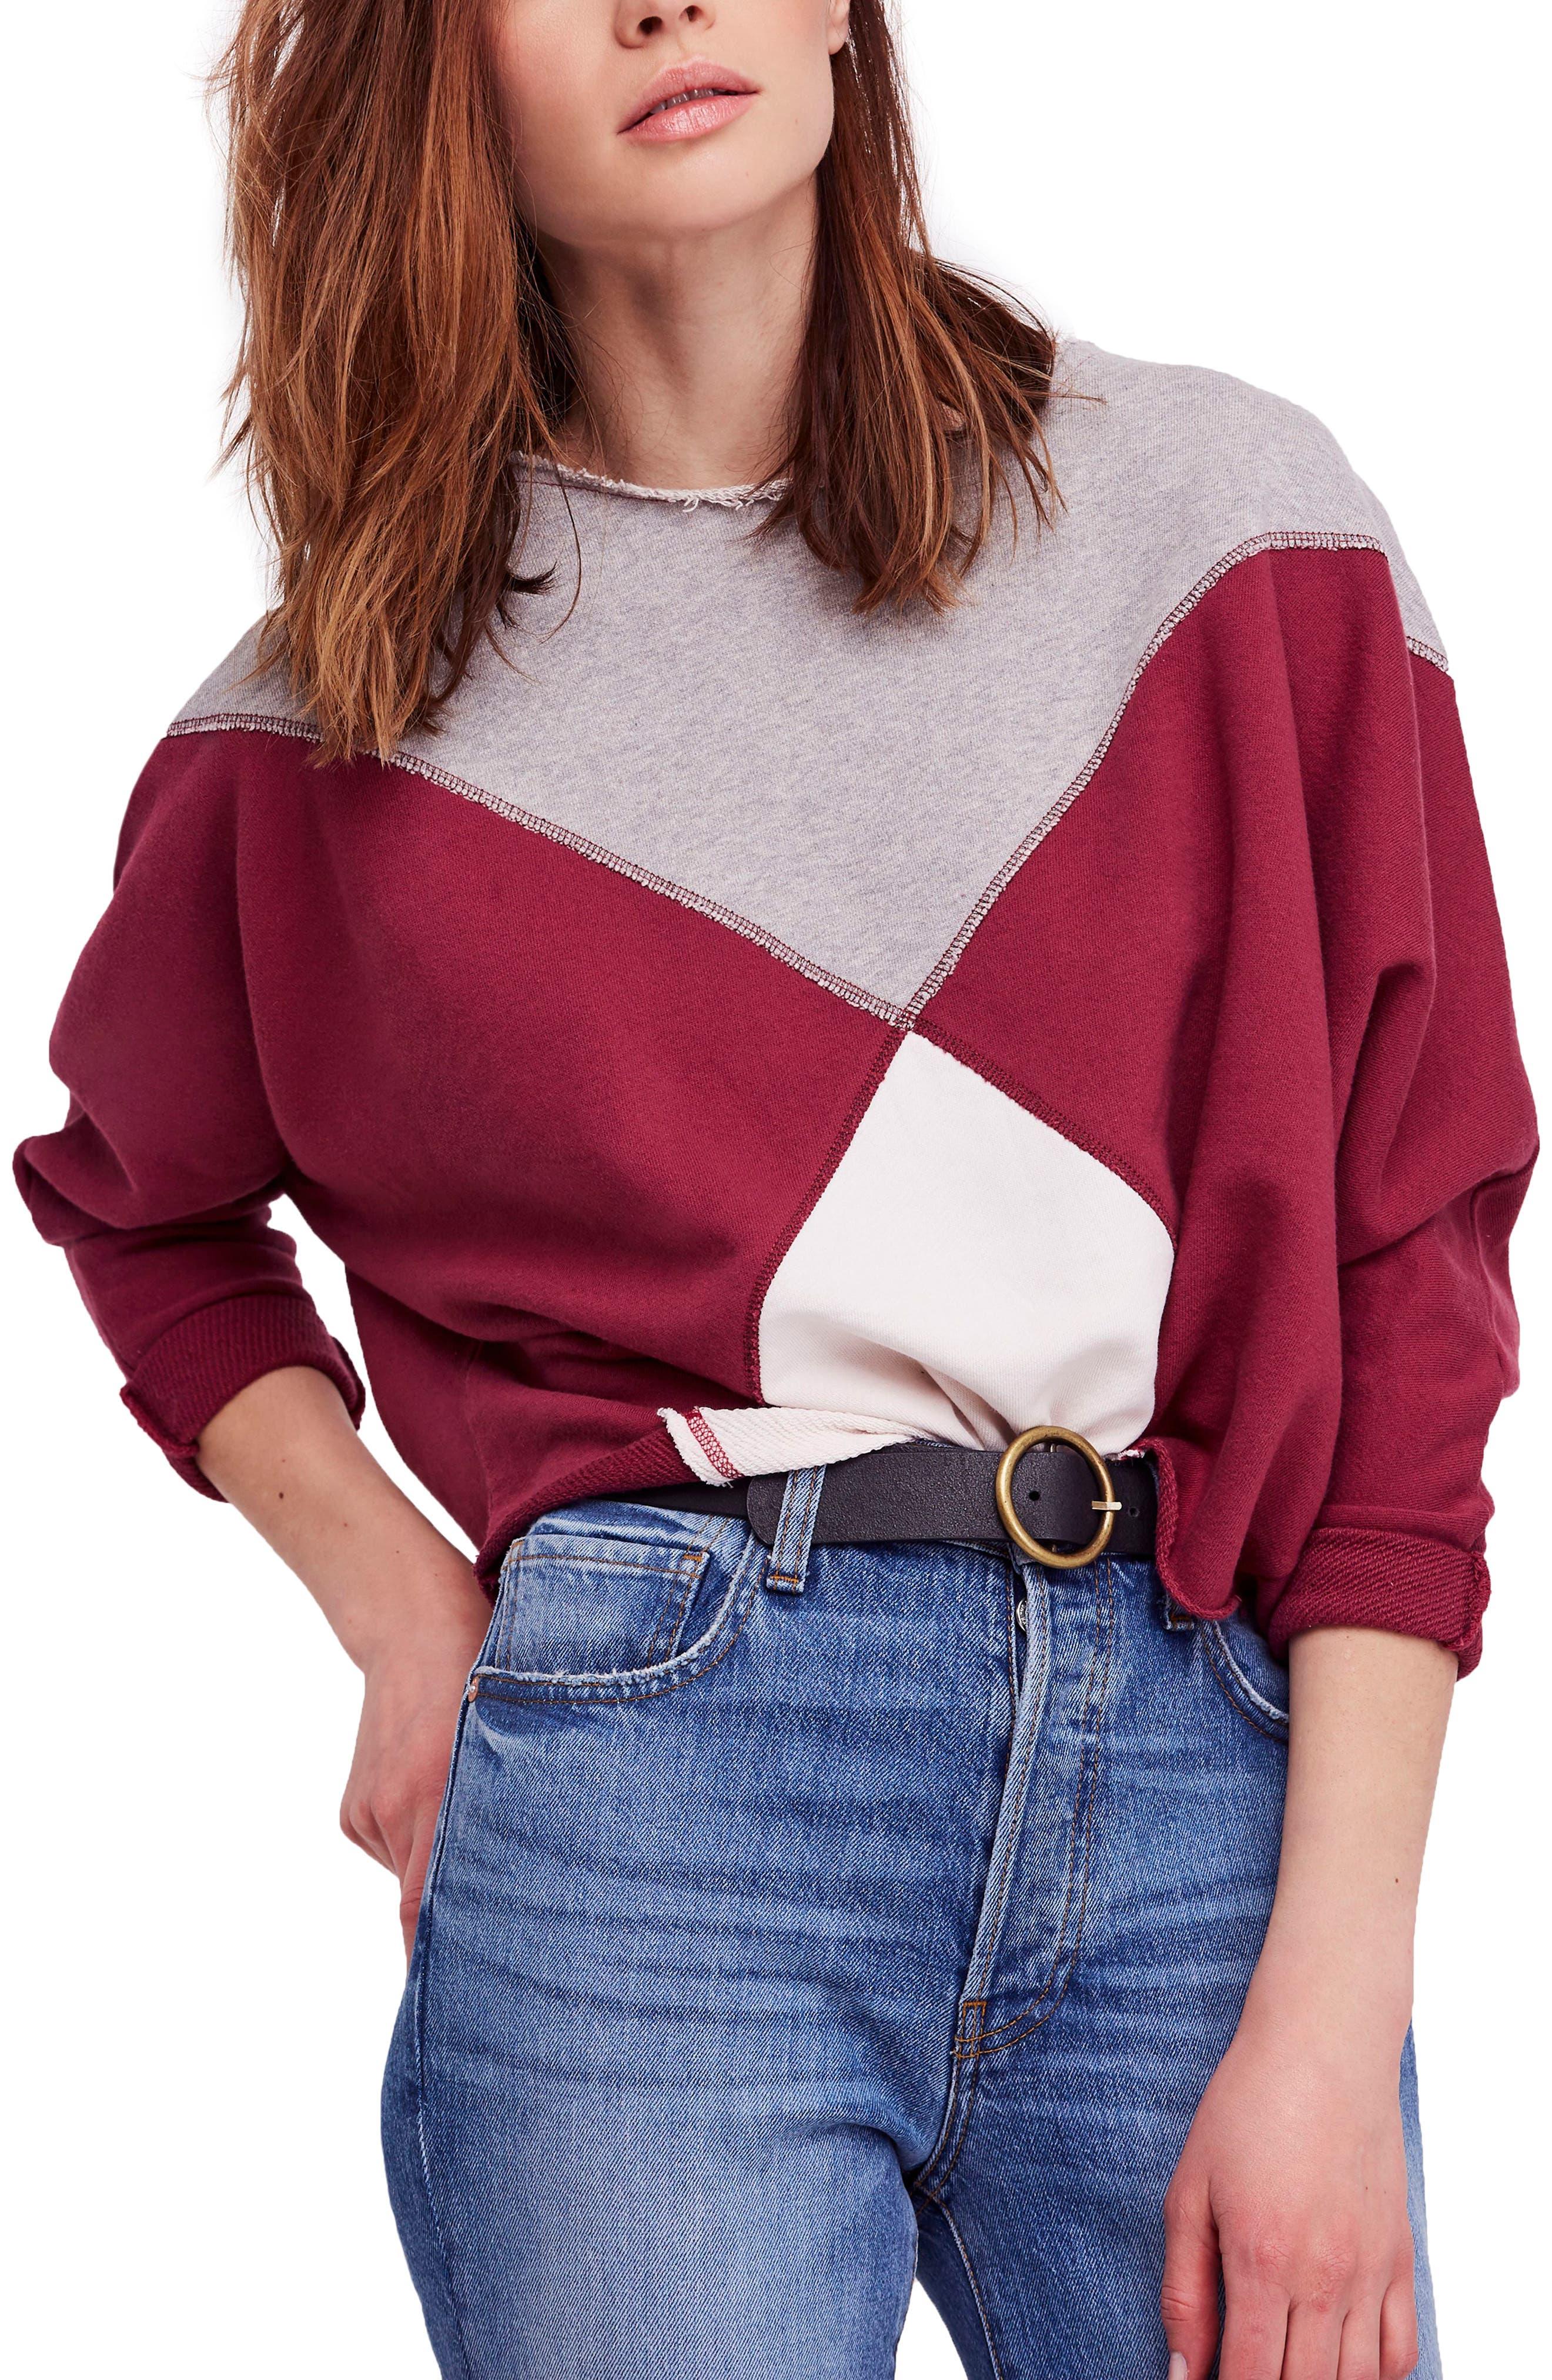 Montauk Sweatshirt,                         Main,                         color, PINK